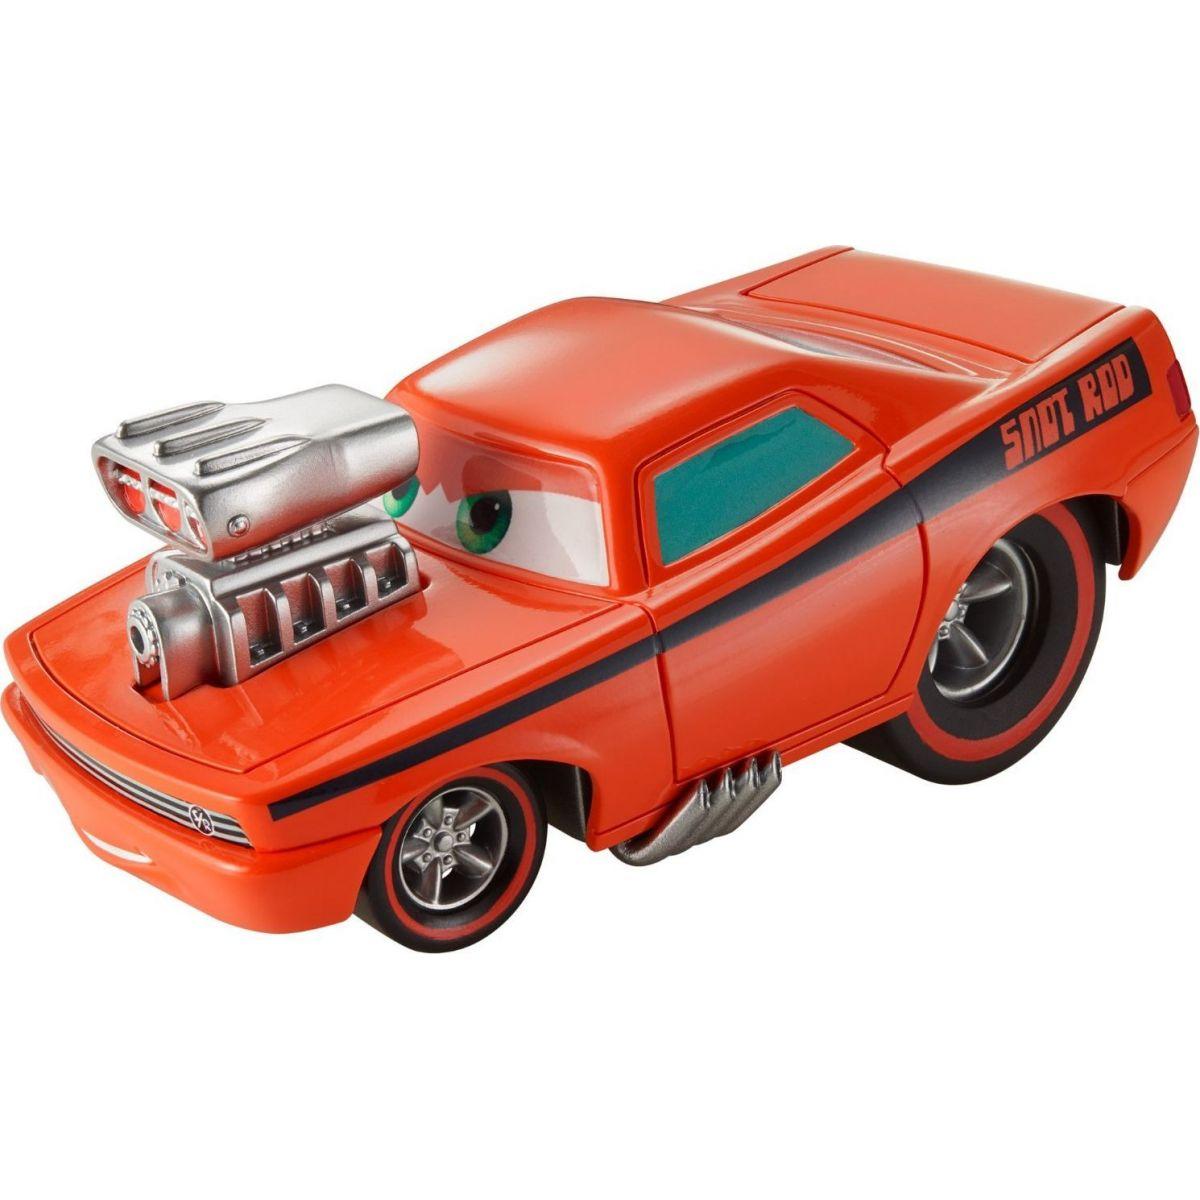 Mattel Cars natahovací autíčko oranžový